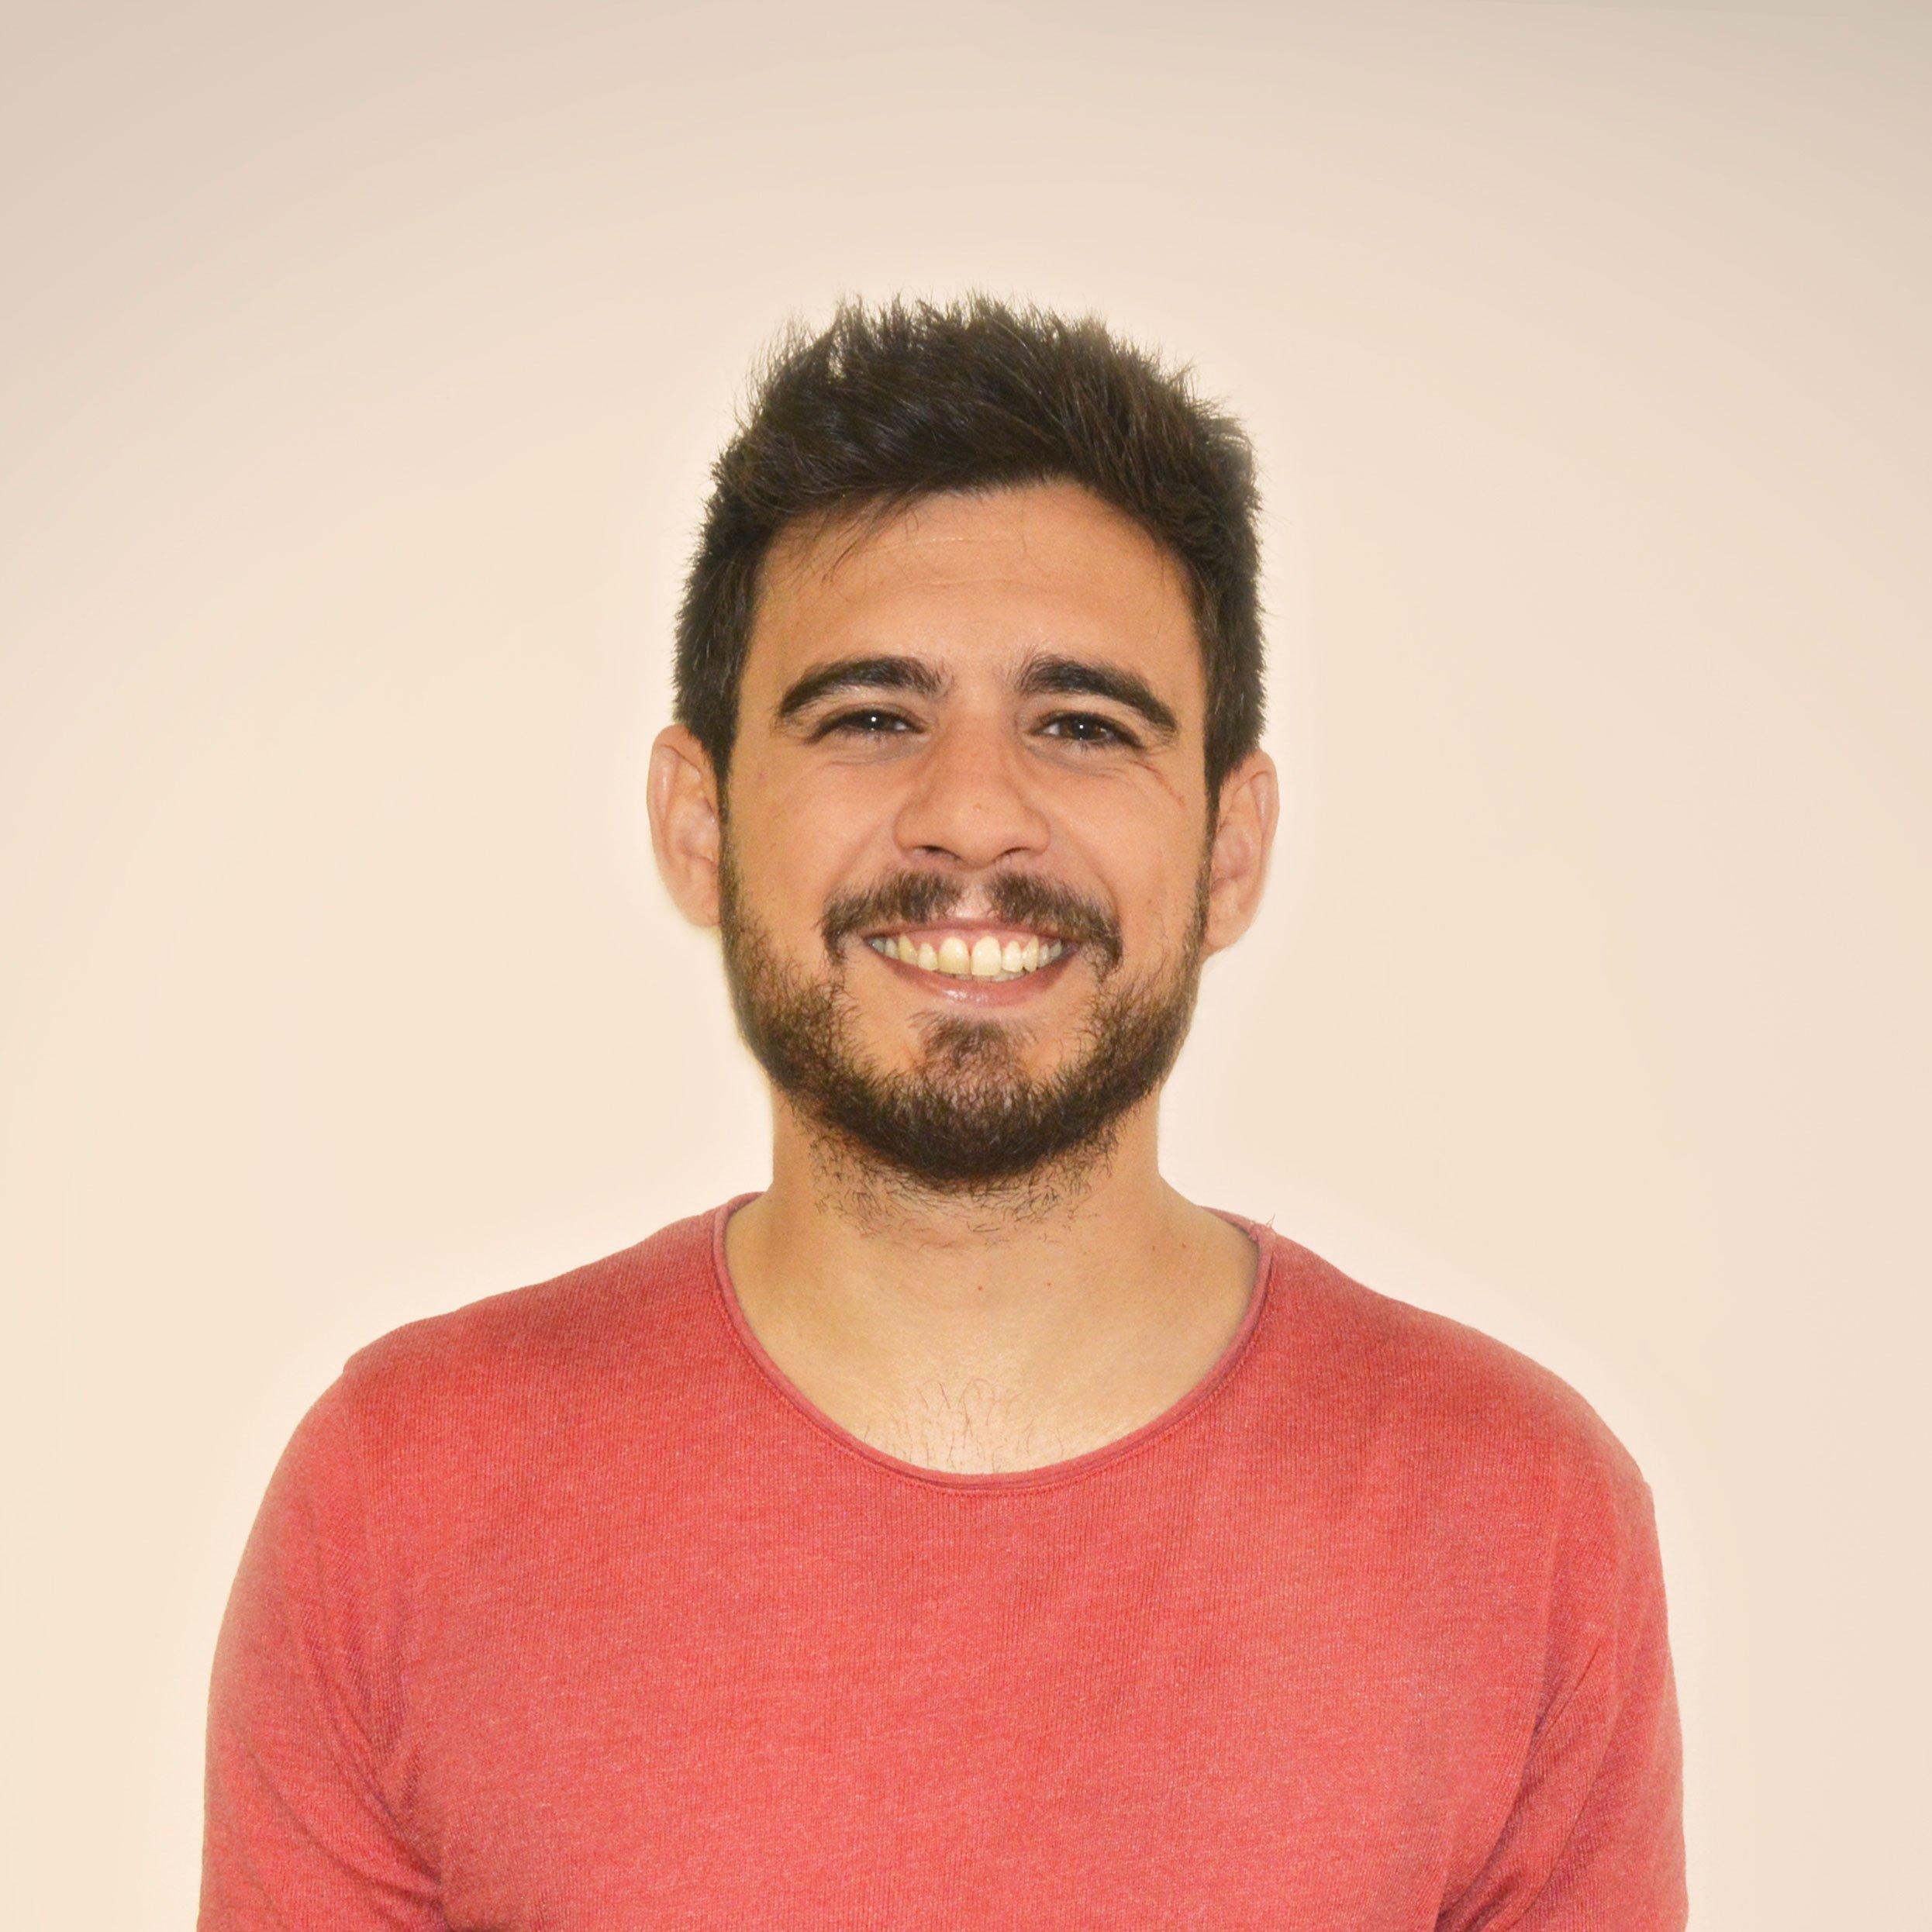 Jose-luis-min.jpg